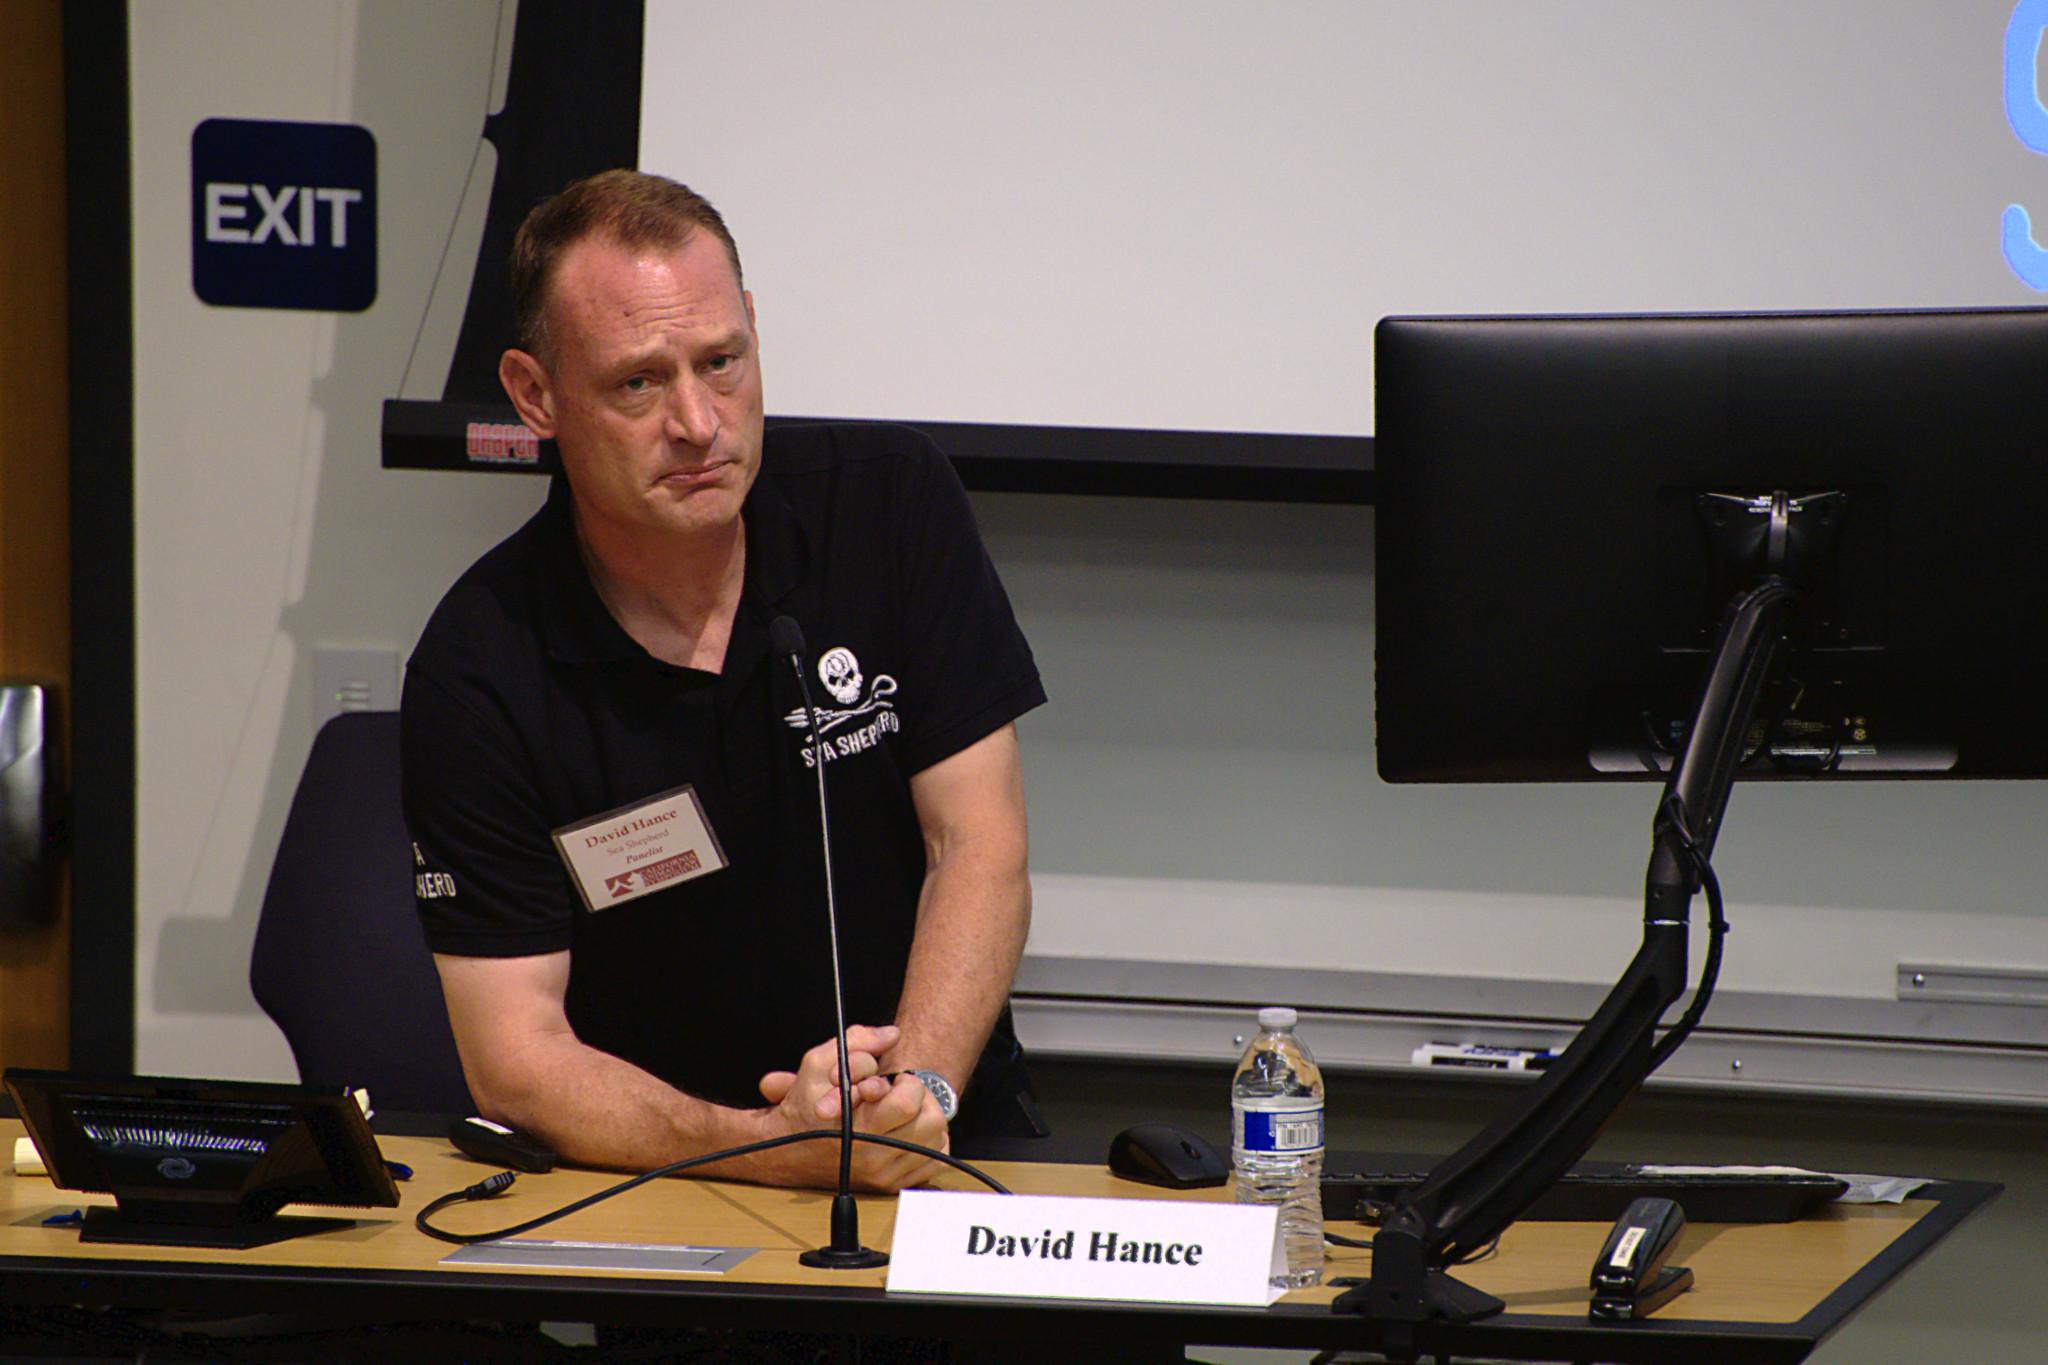 Panelist: David Hance from Sea Shepherd